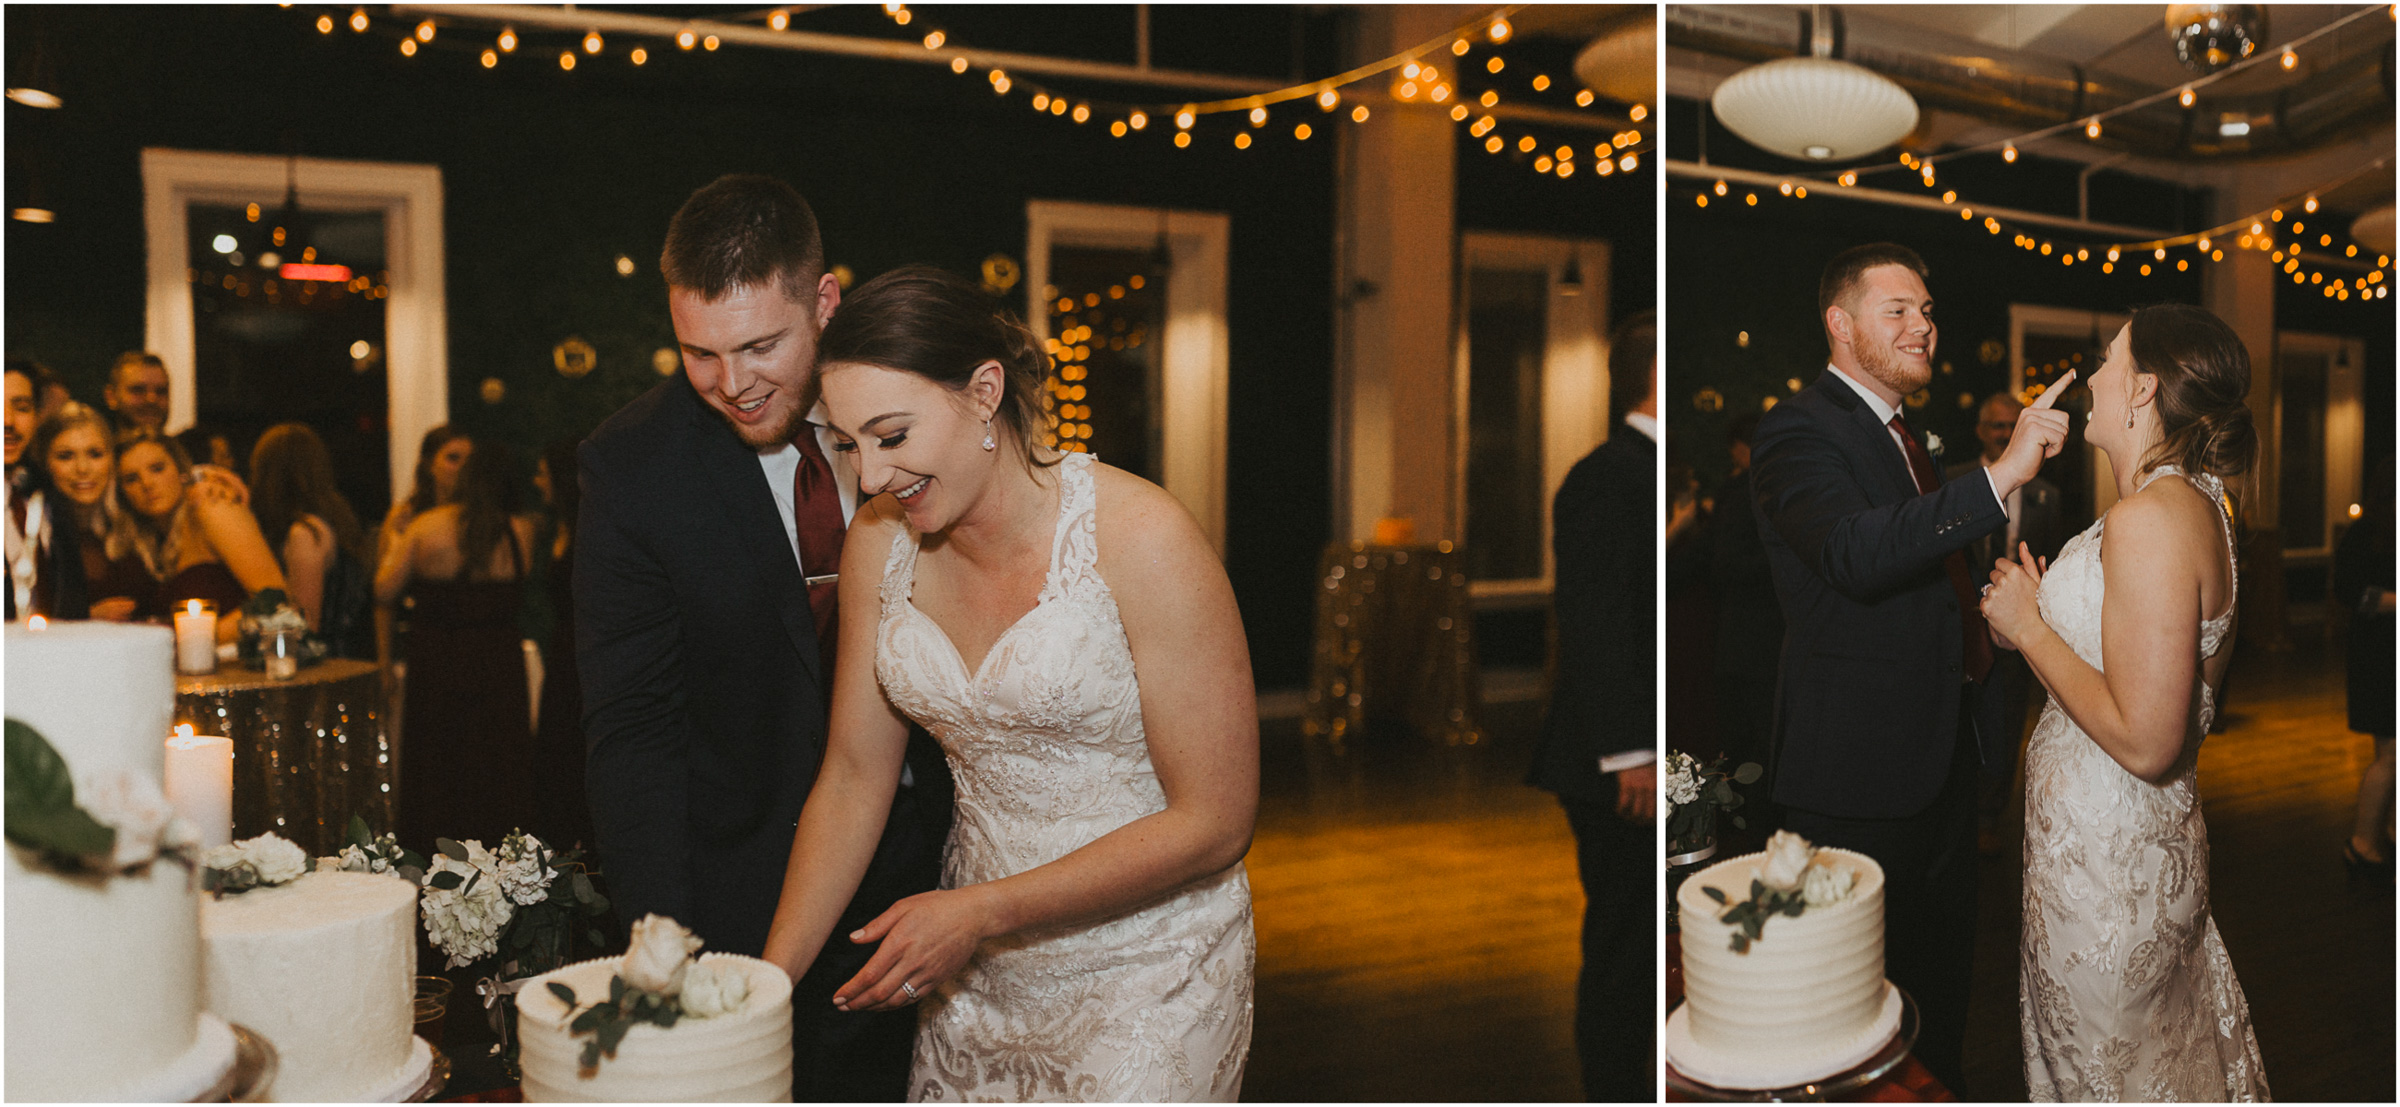 alyssa barletter photography 2016 main kansas city wedding rainy day photographer grace and justin magott-76.jpg